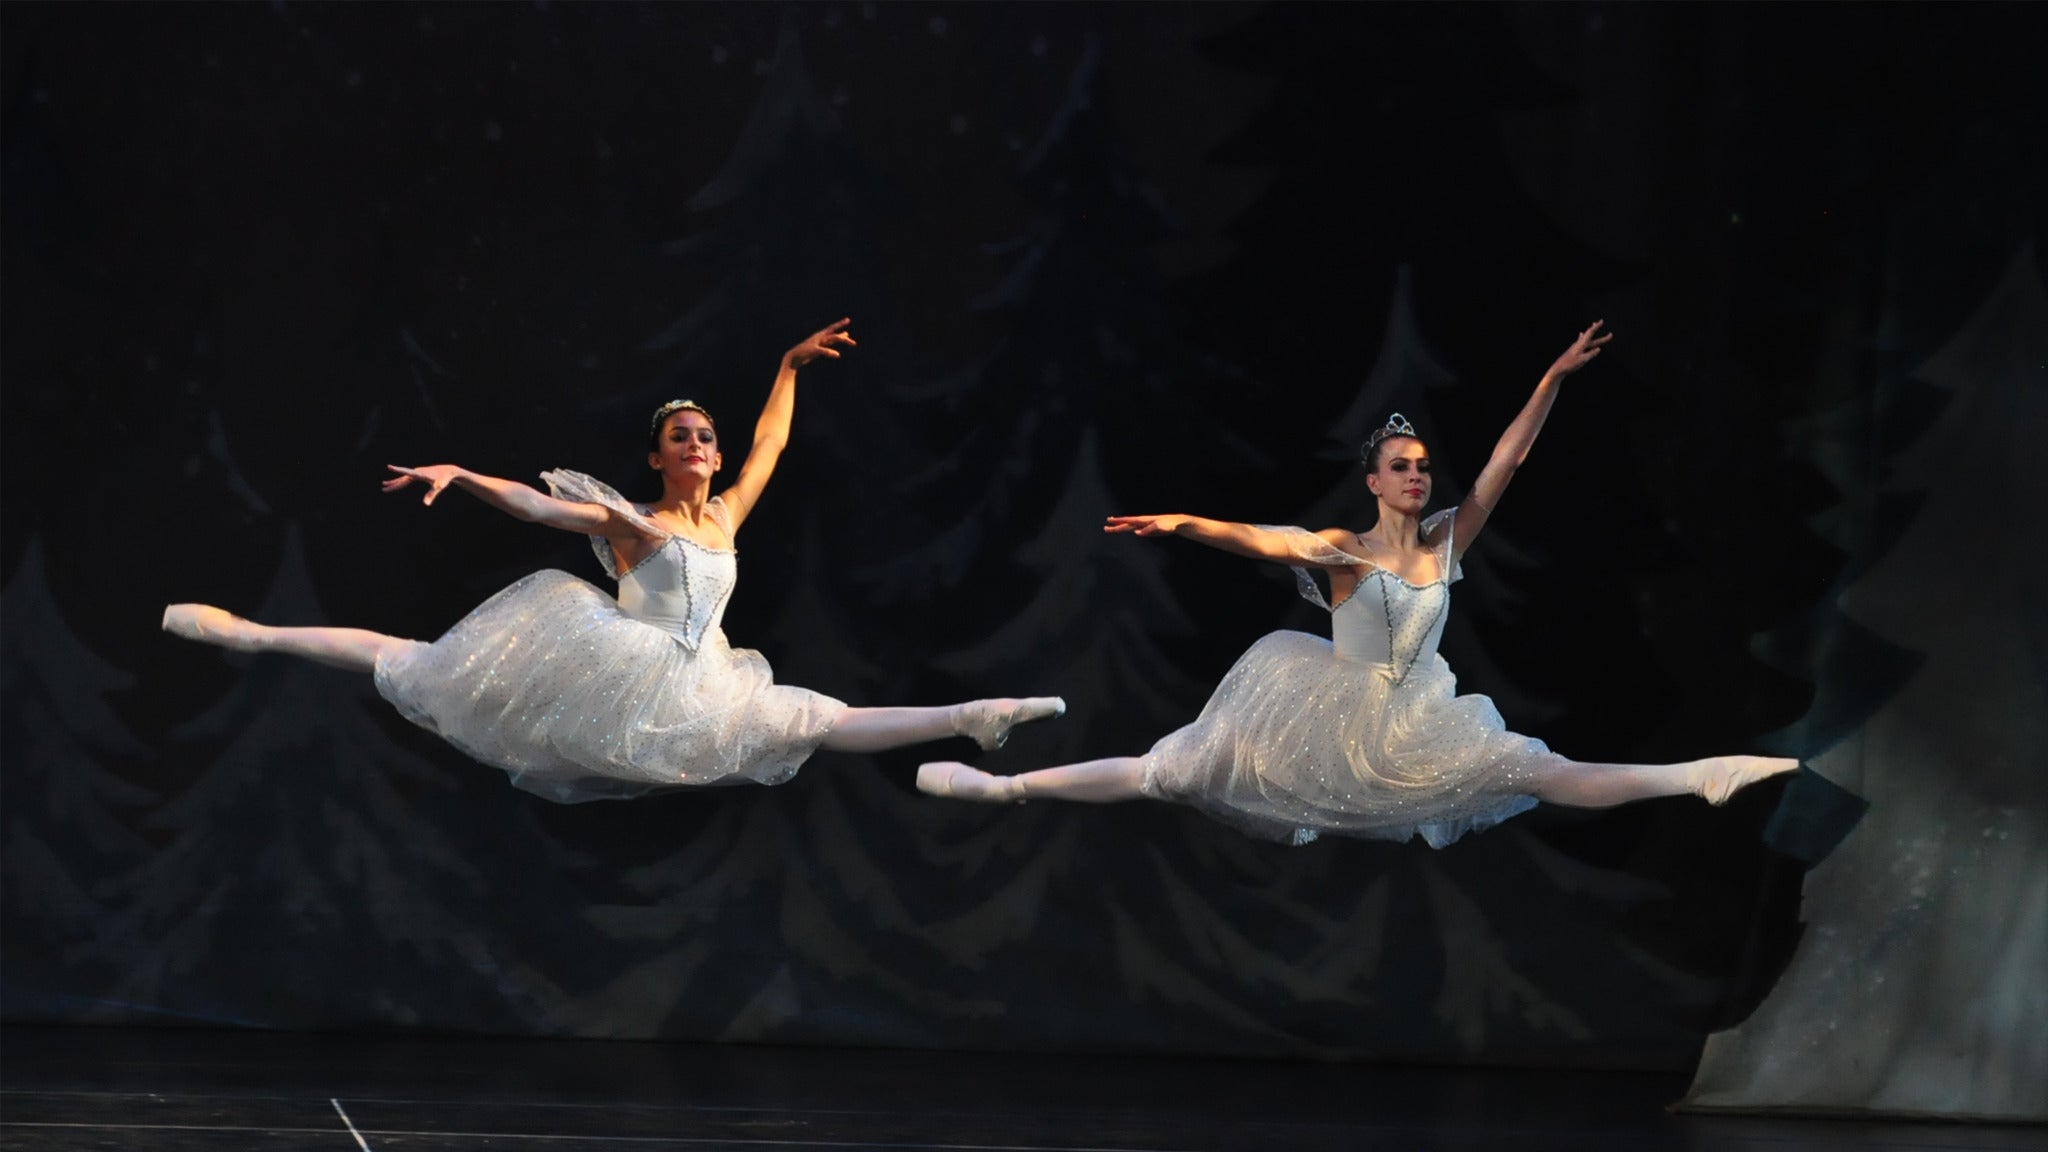 The Nutcracker - Thomas Armour Youth Ballet